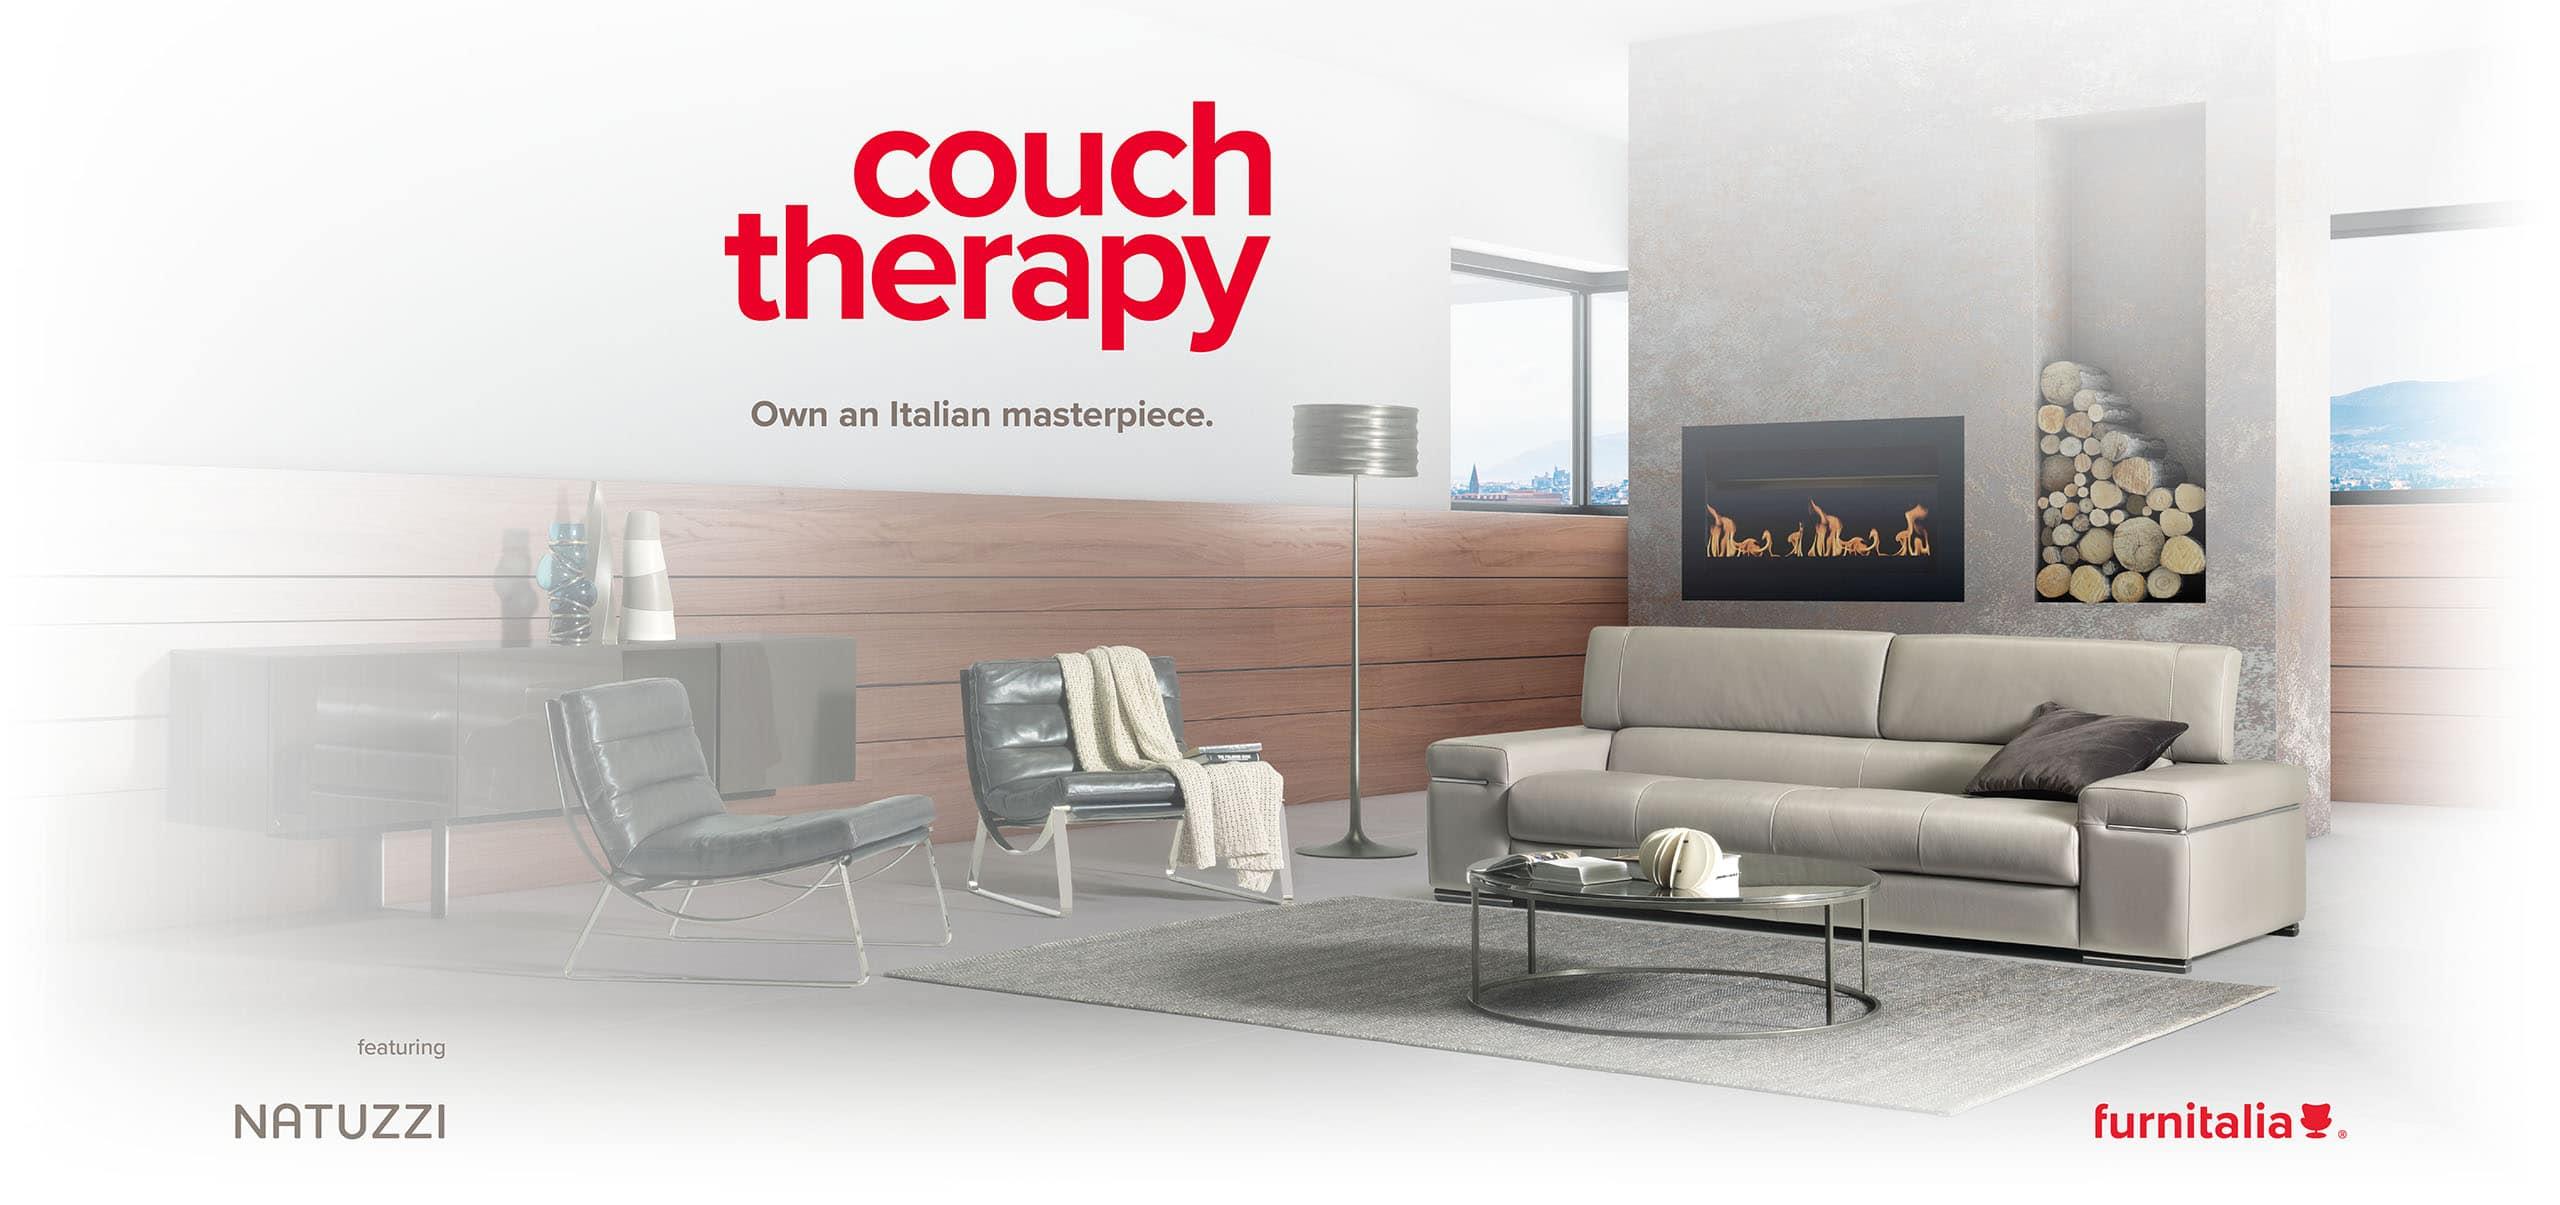 Enjoy modern contemporary home furniture like this Avana sofa from Natuzzi Italia.